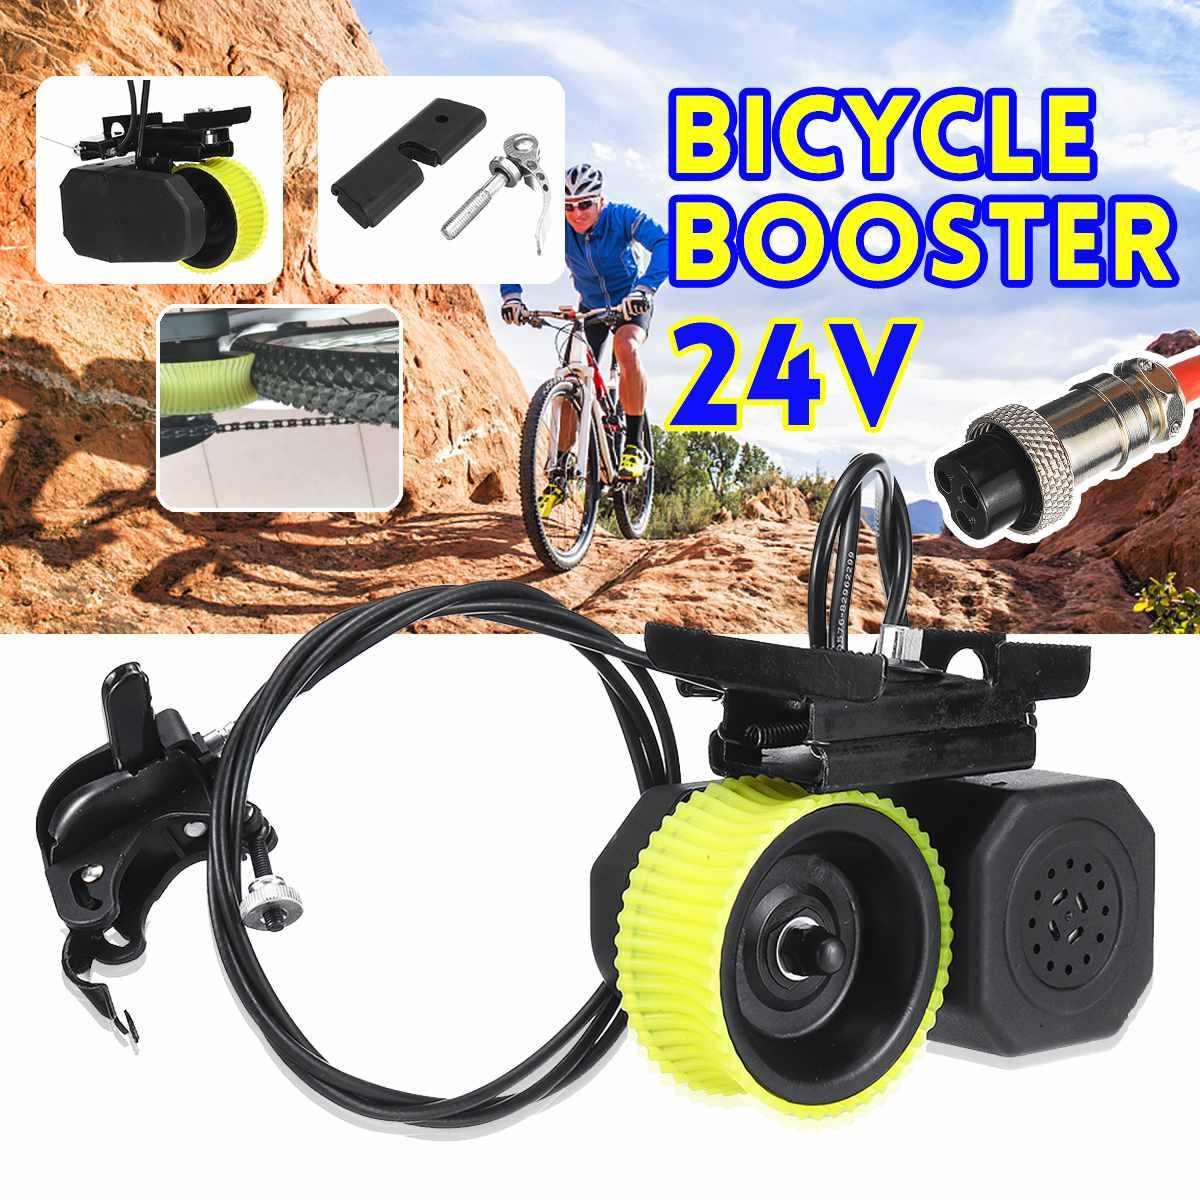 24V Bicycle Bike Booster Durable for E-Bike Electric Mountain Bike Bicycle DIY